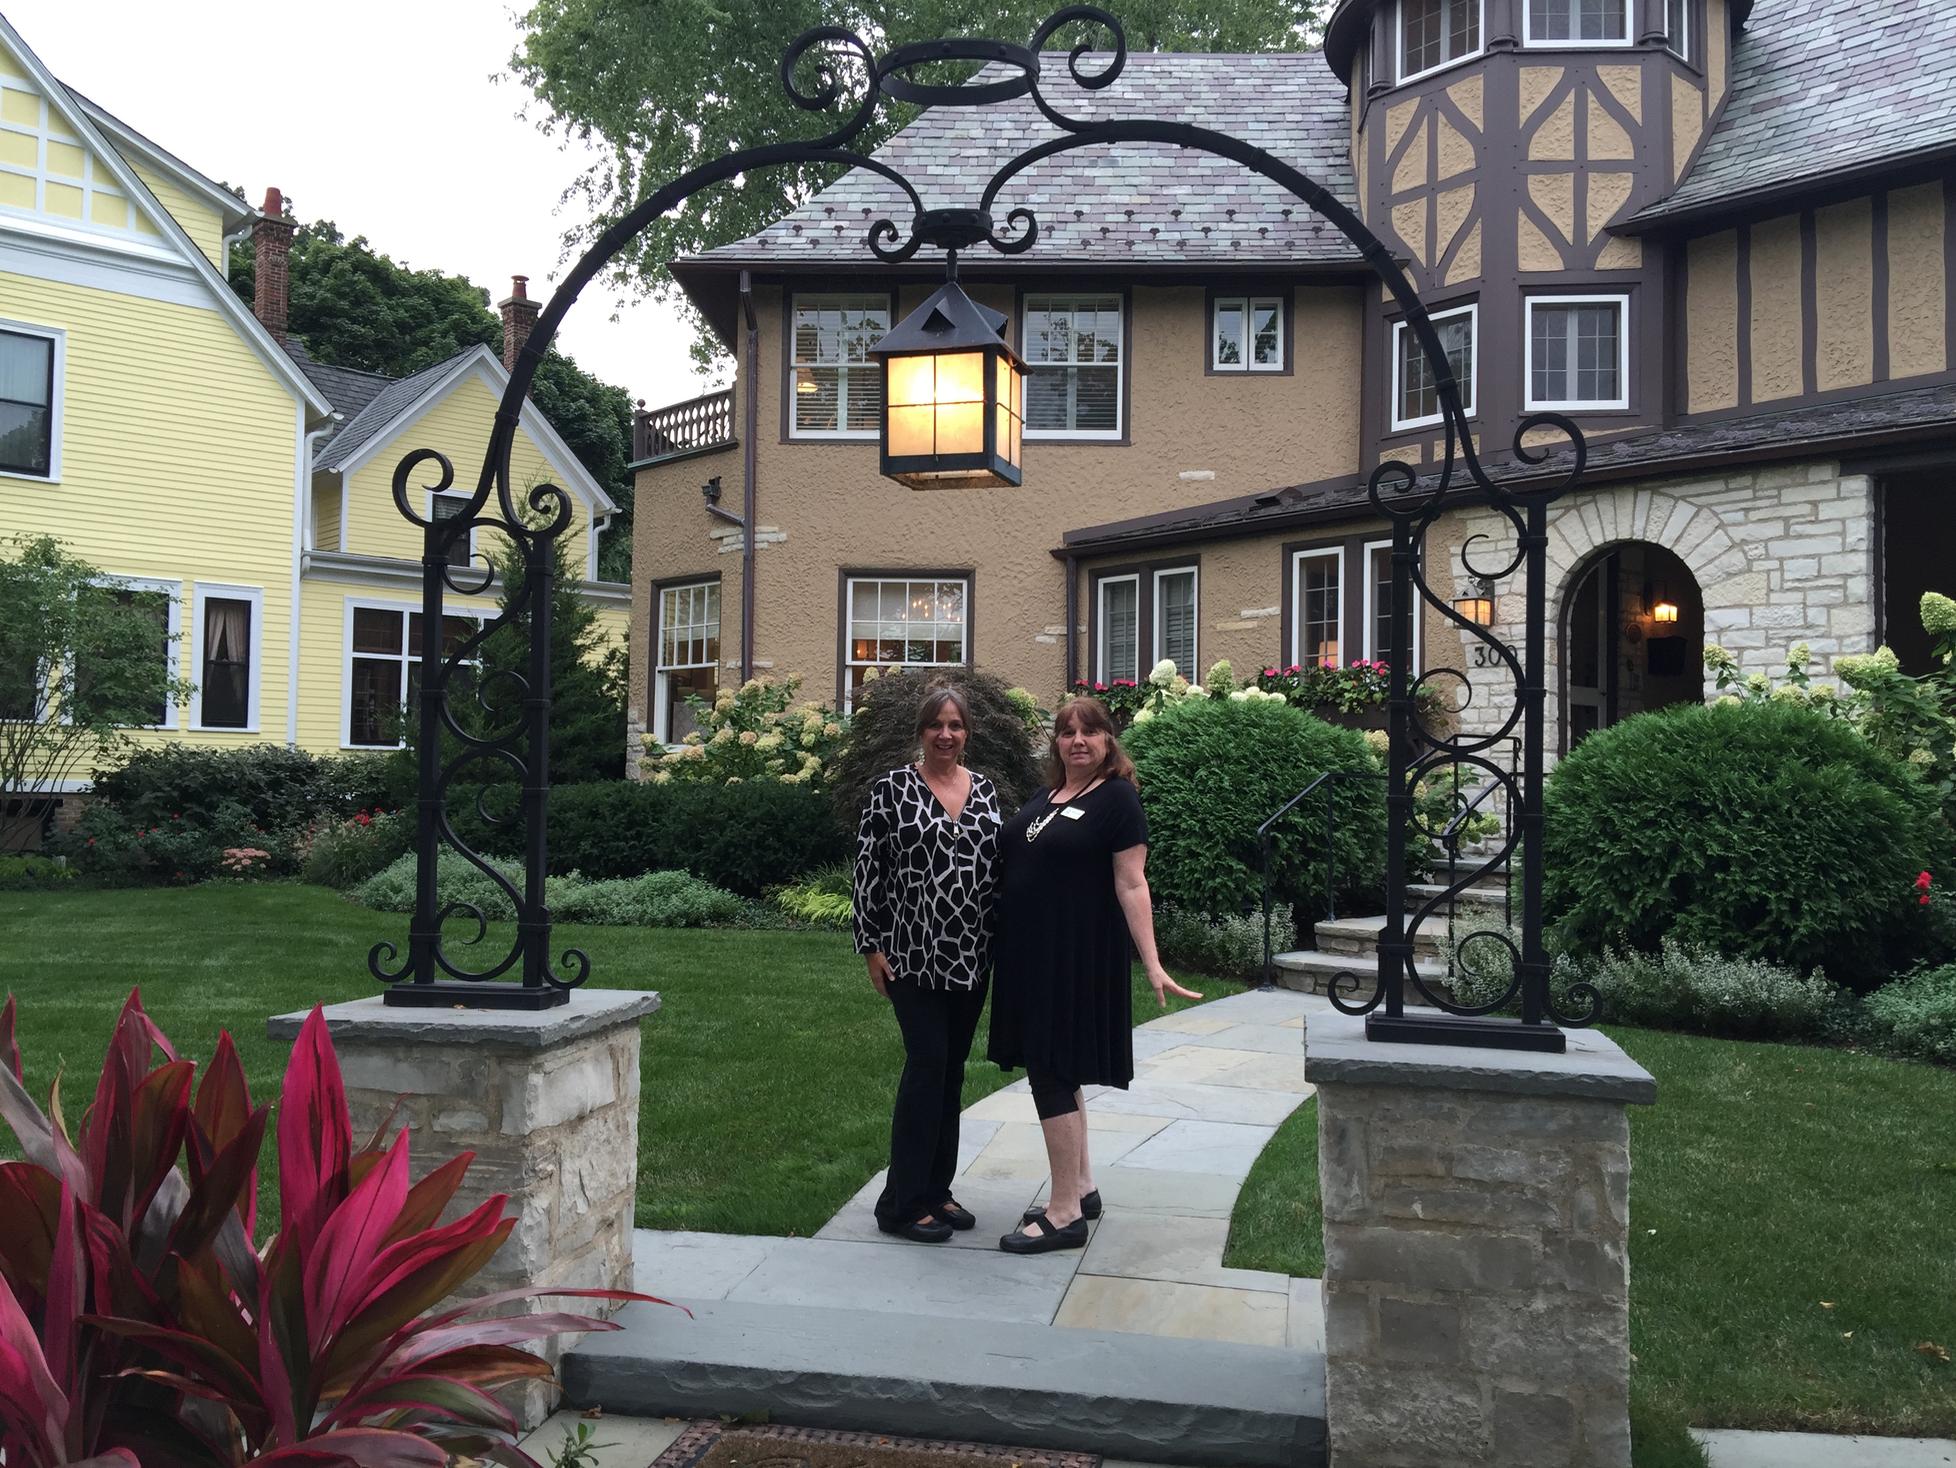 Sharon Minick & Lisa Boyd with Luxury Stone Porch